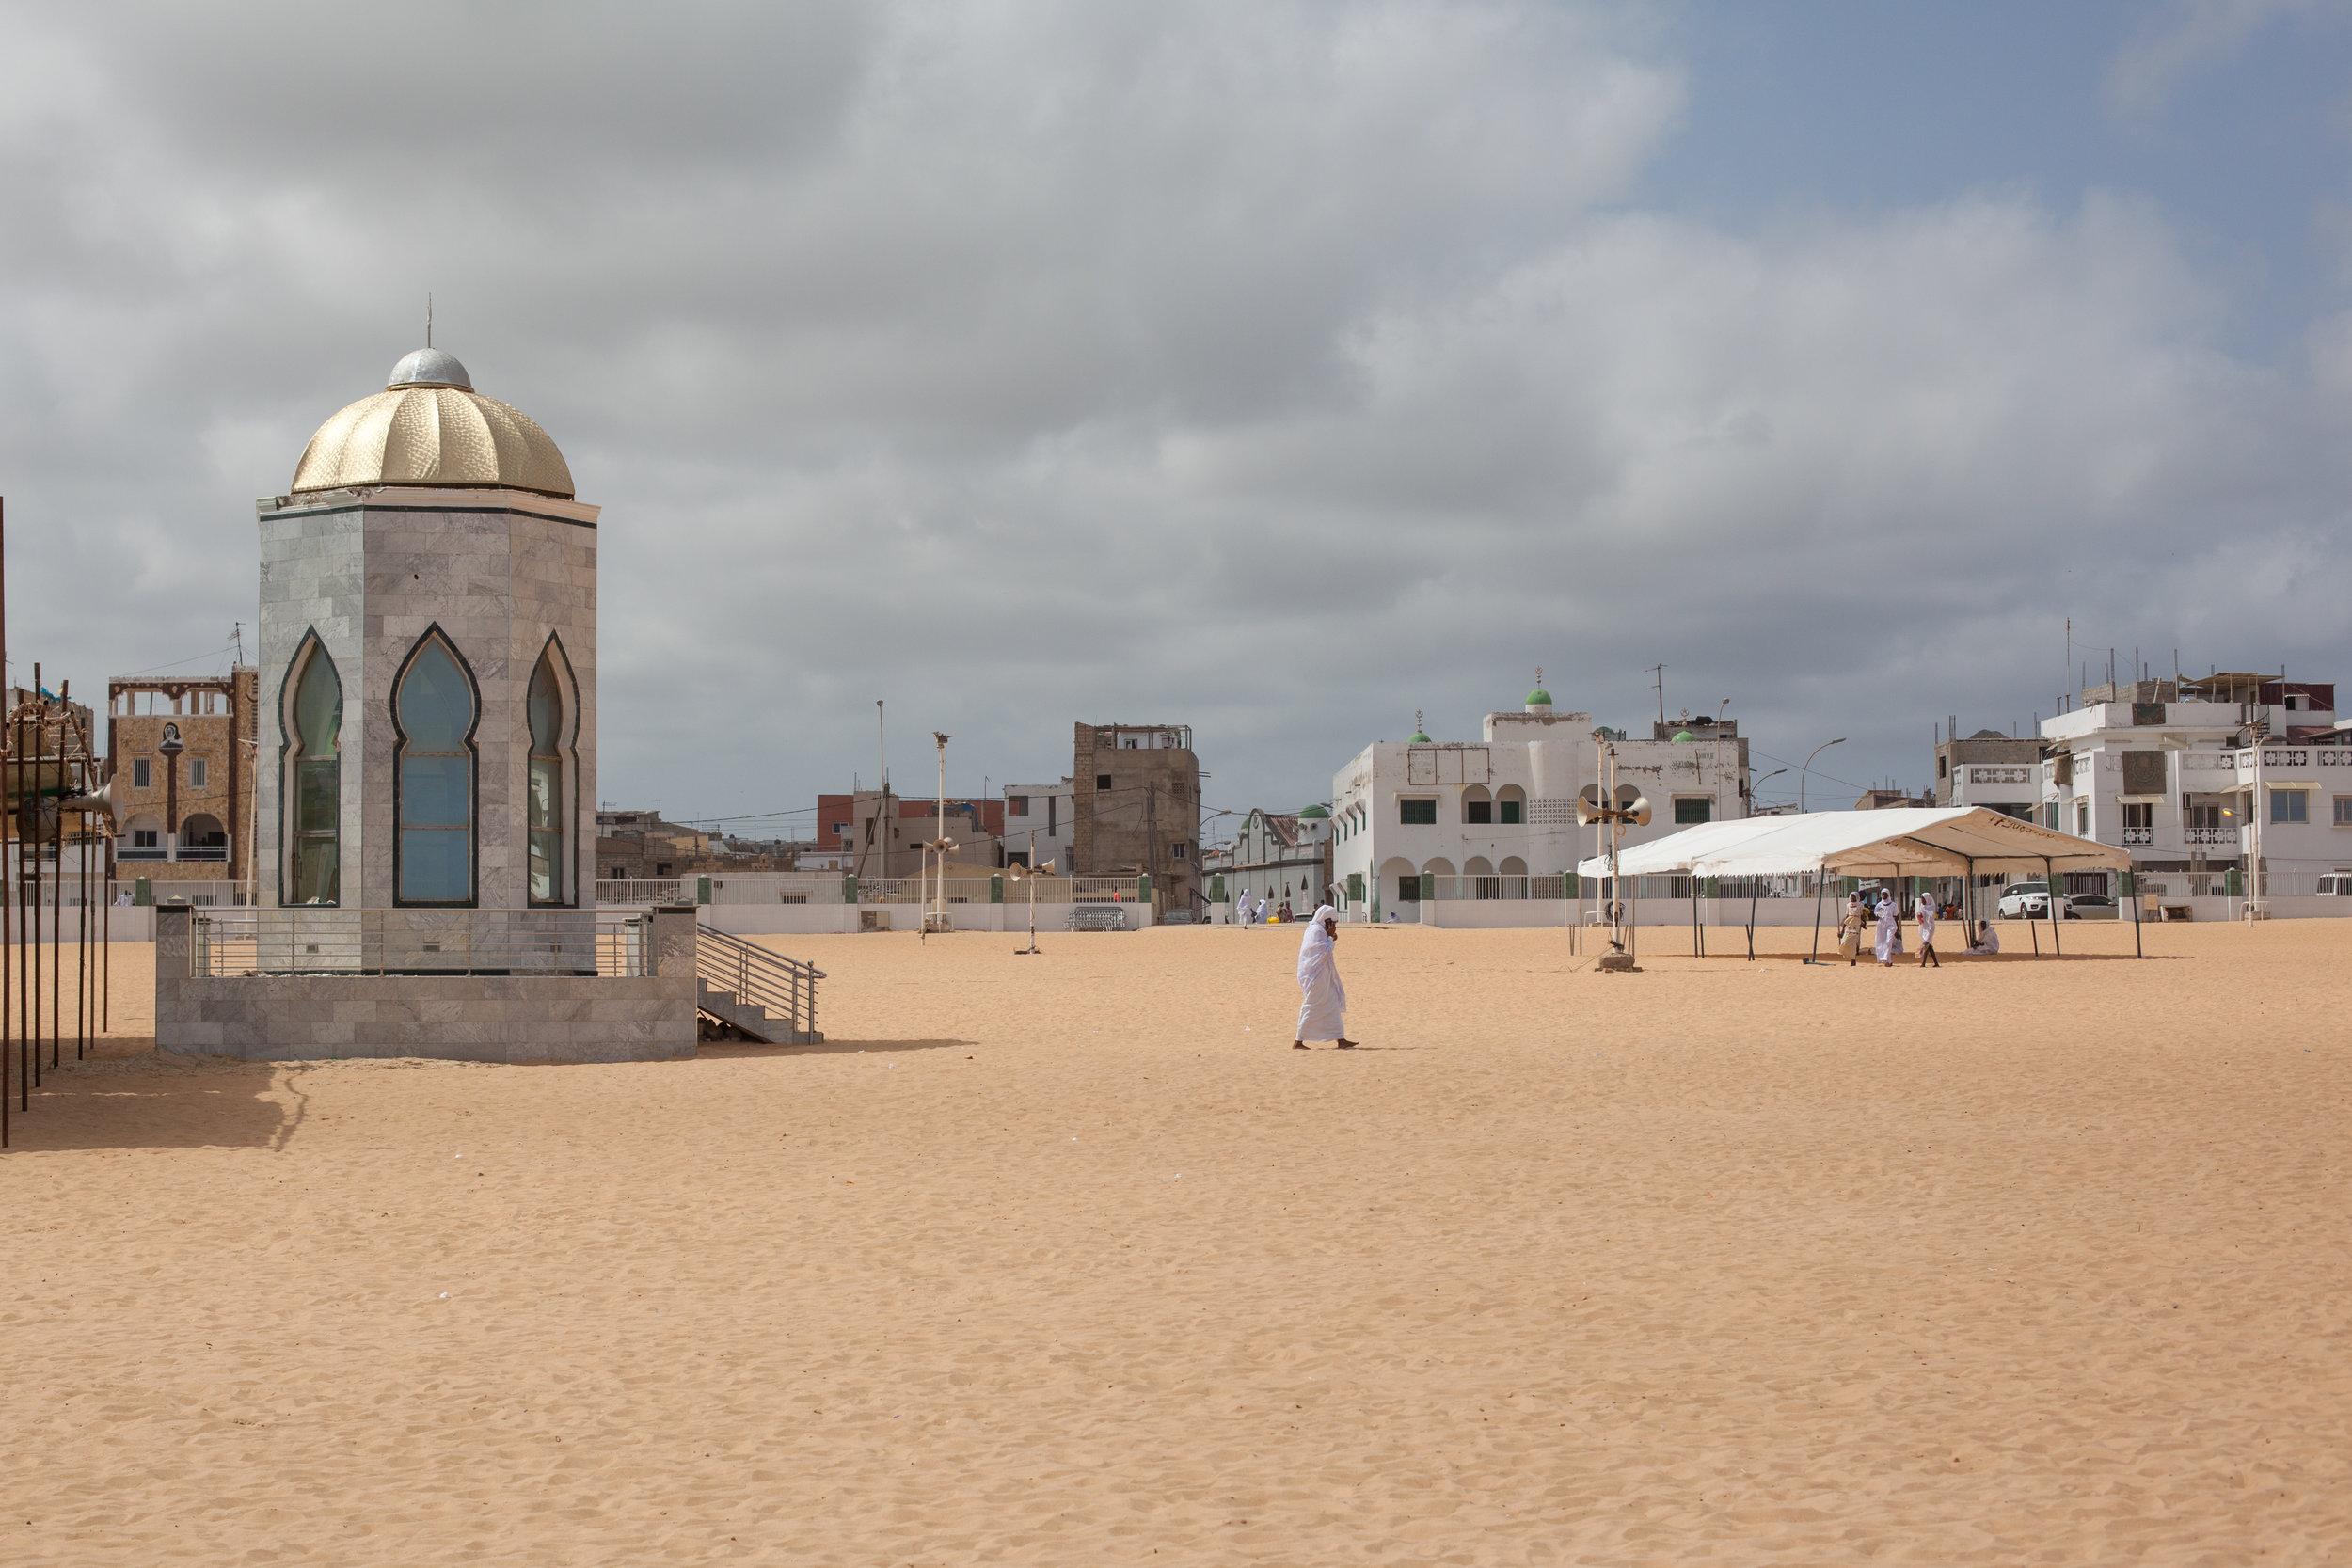 The Grande Mosquée de Yoff, Dakar, Senegal.